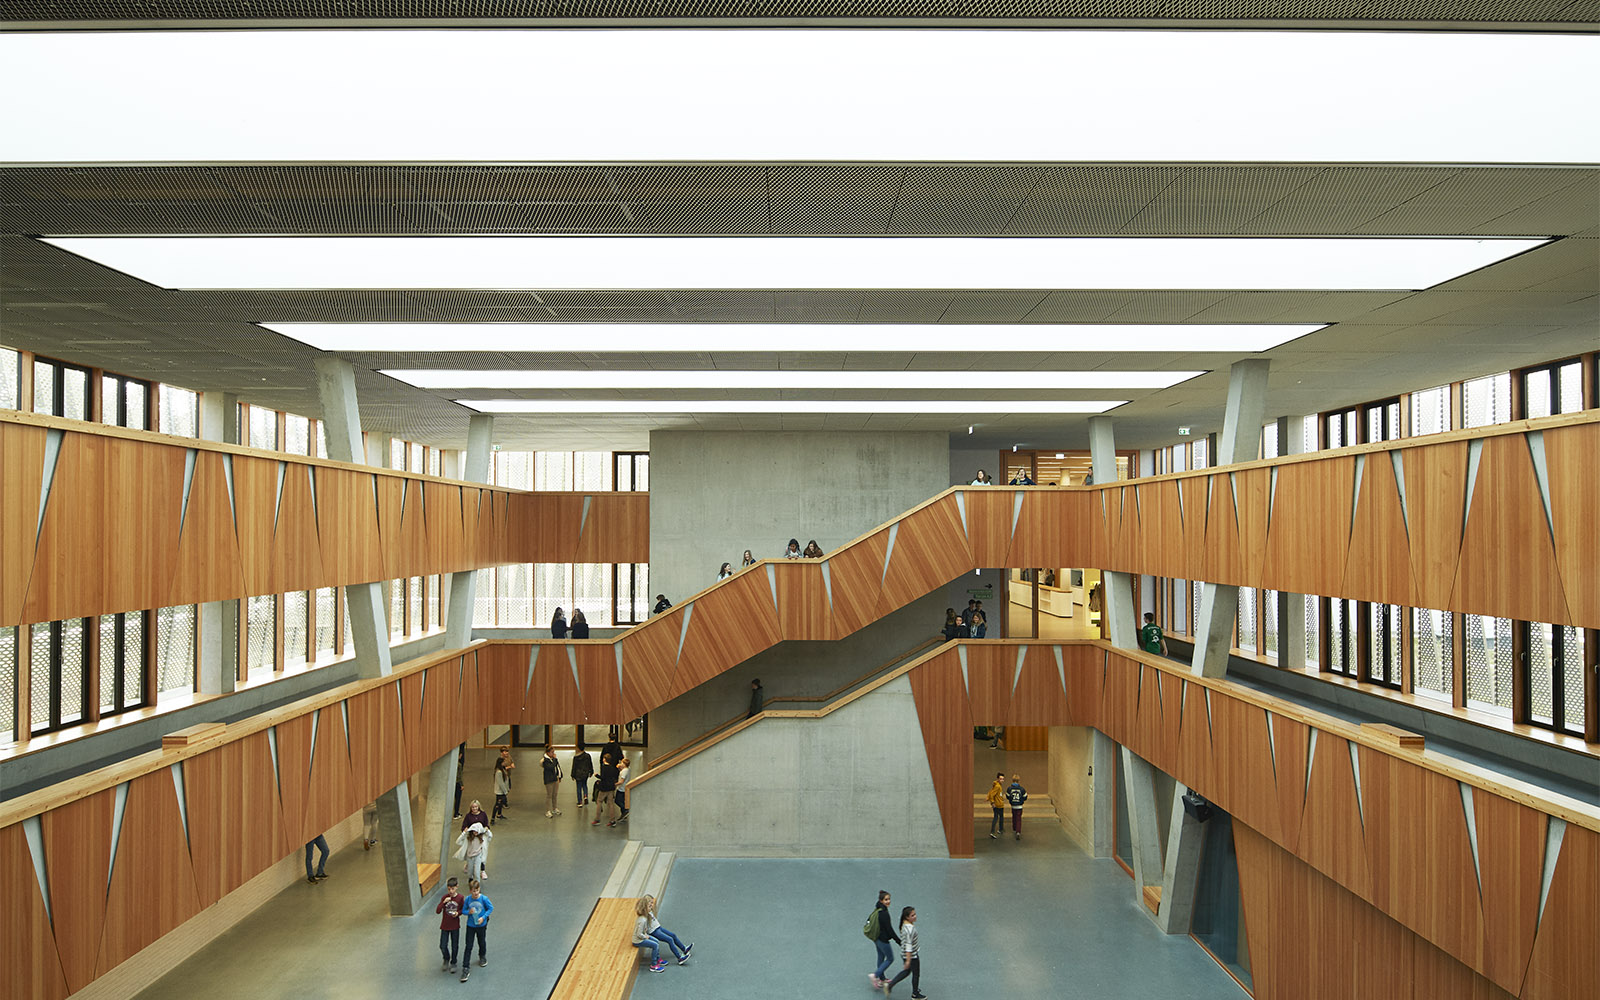 Architectural acoustics in school building